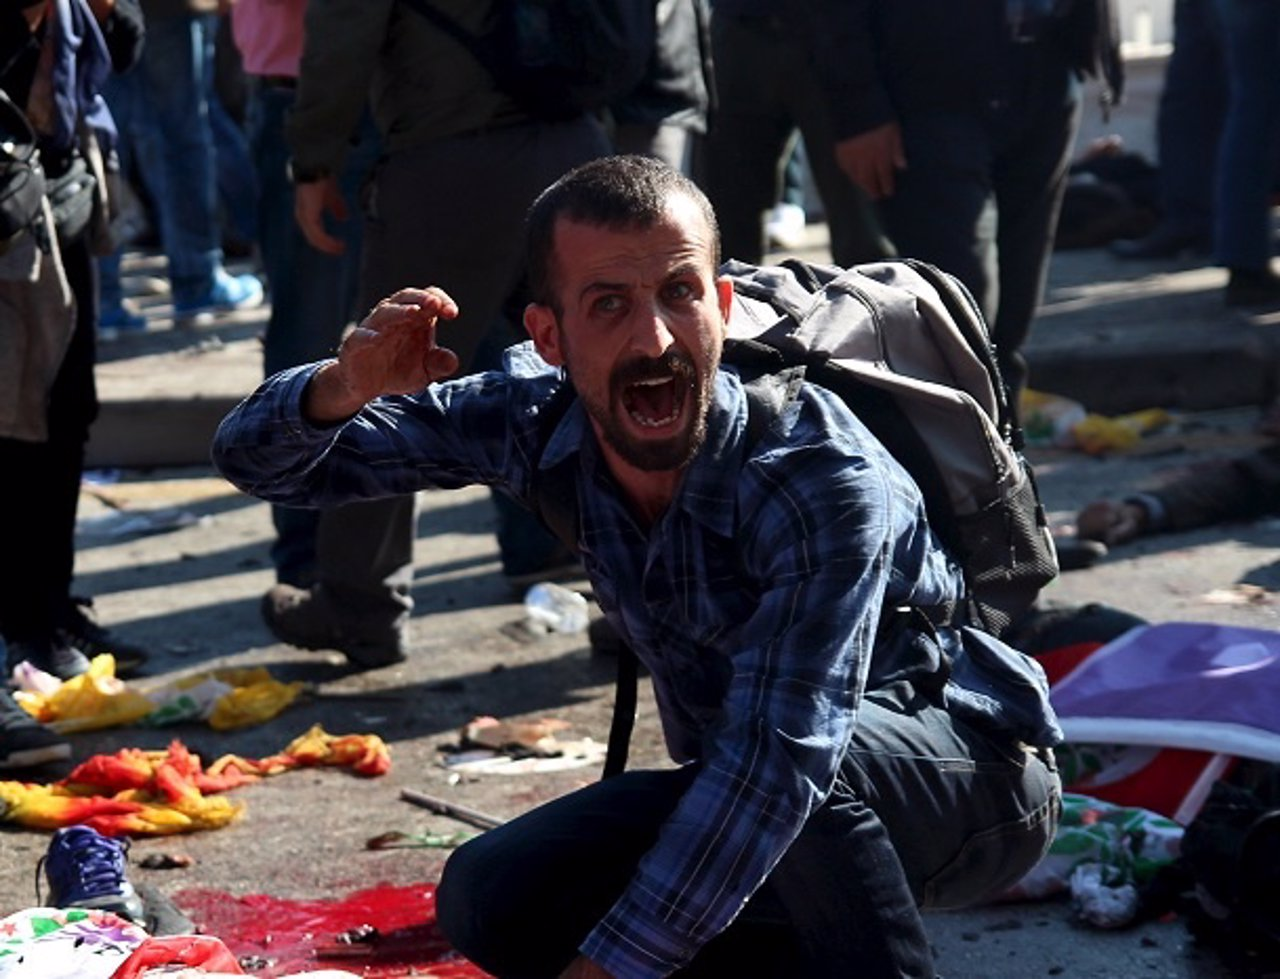 Atentado terrorista en Ankara, Turquía